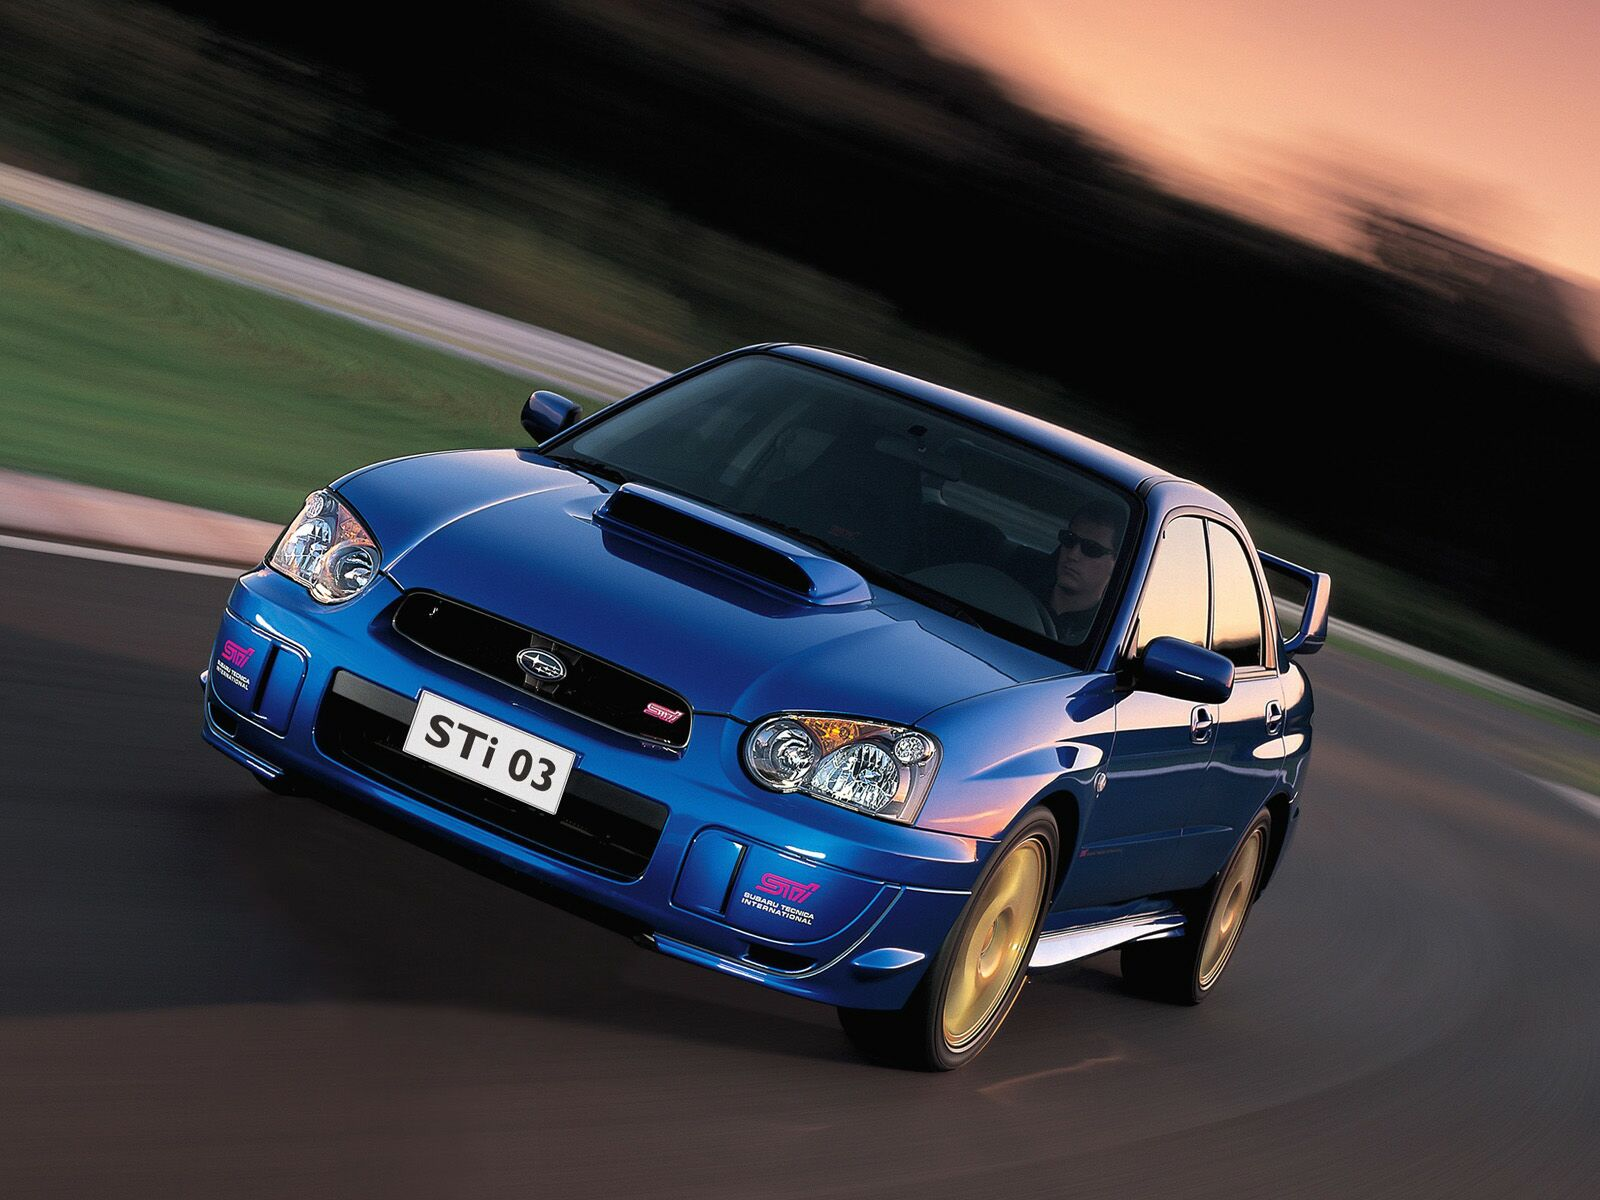 Picture of 2005 Subaru Impreza WRX STi Base